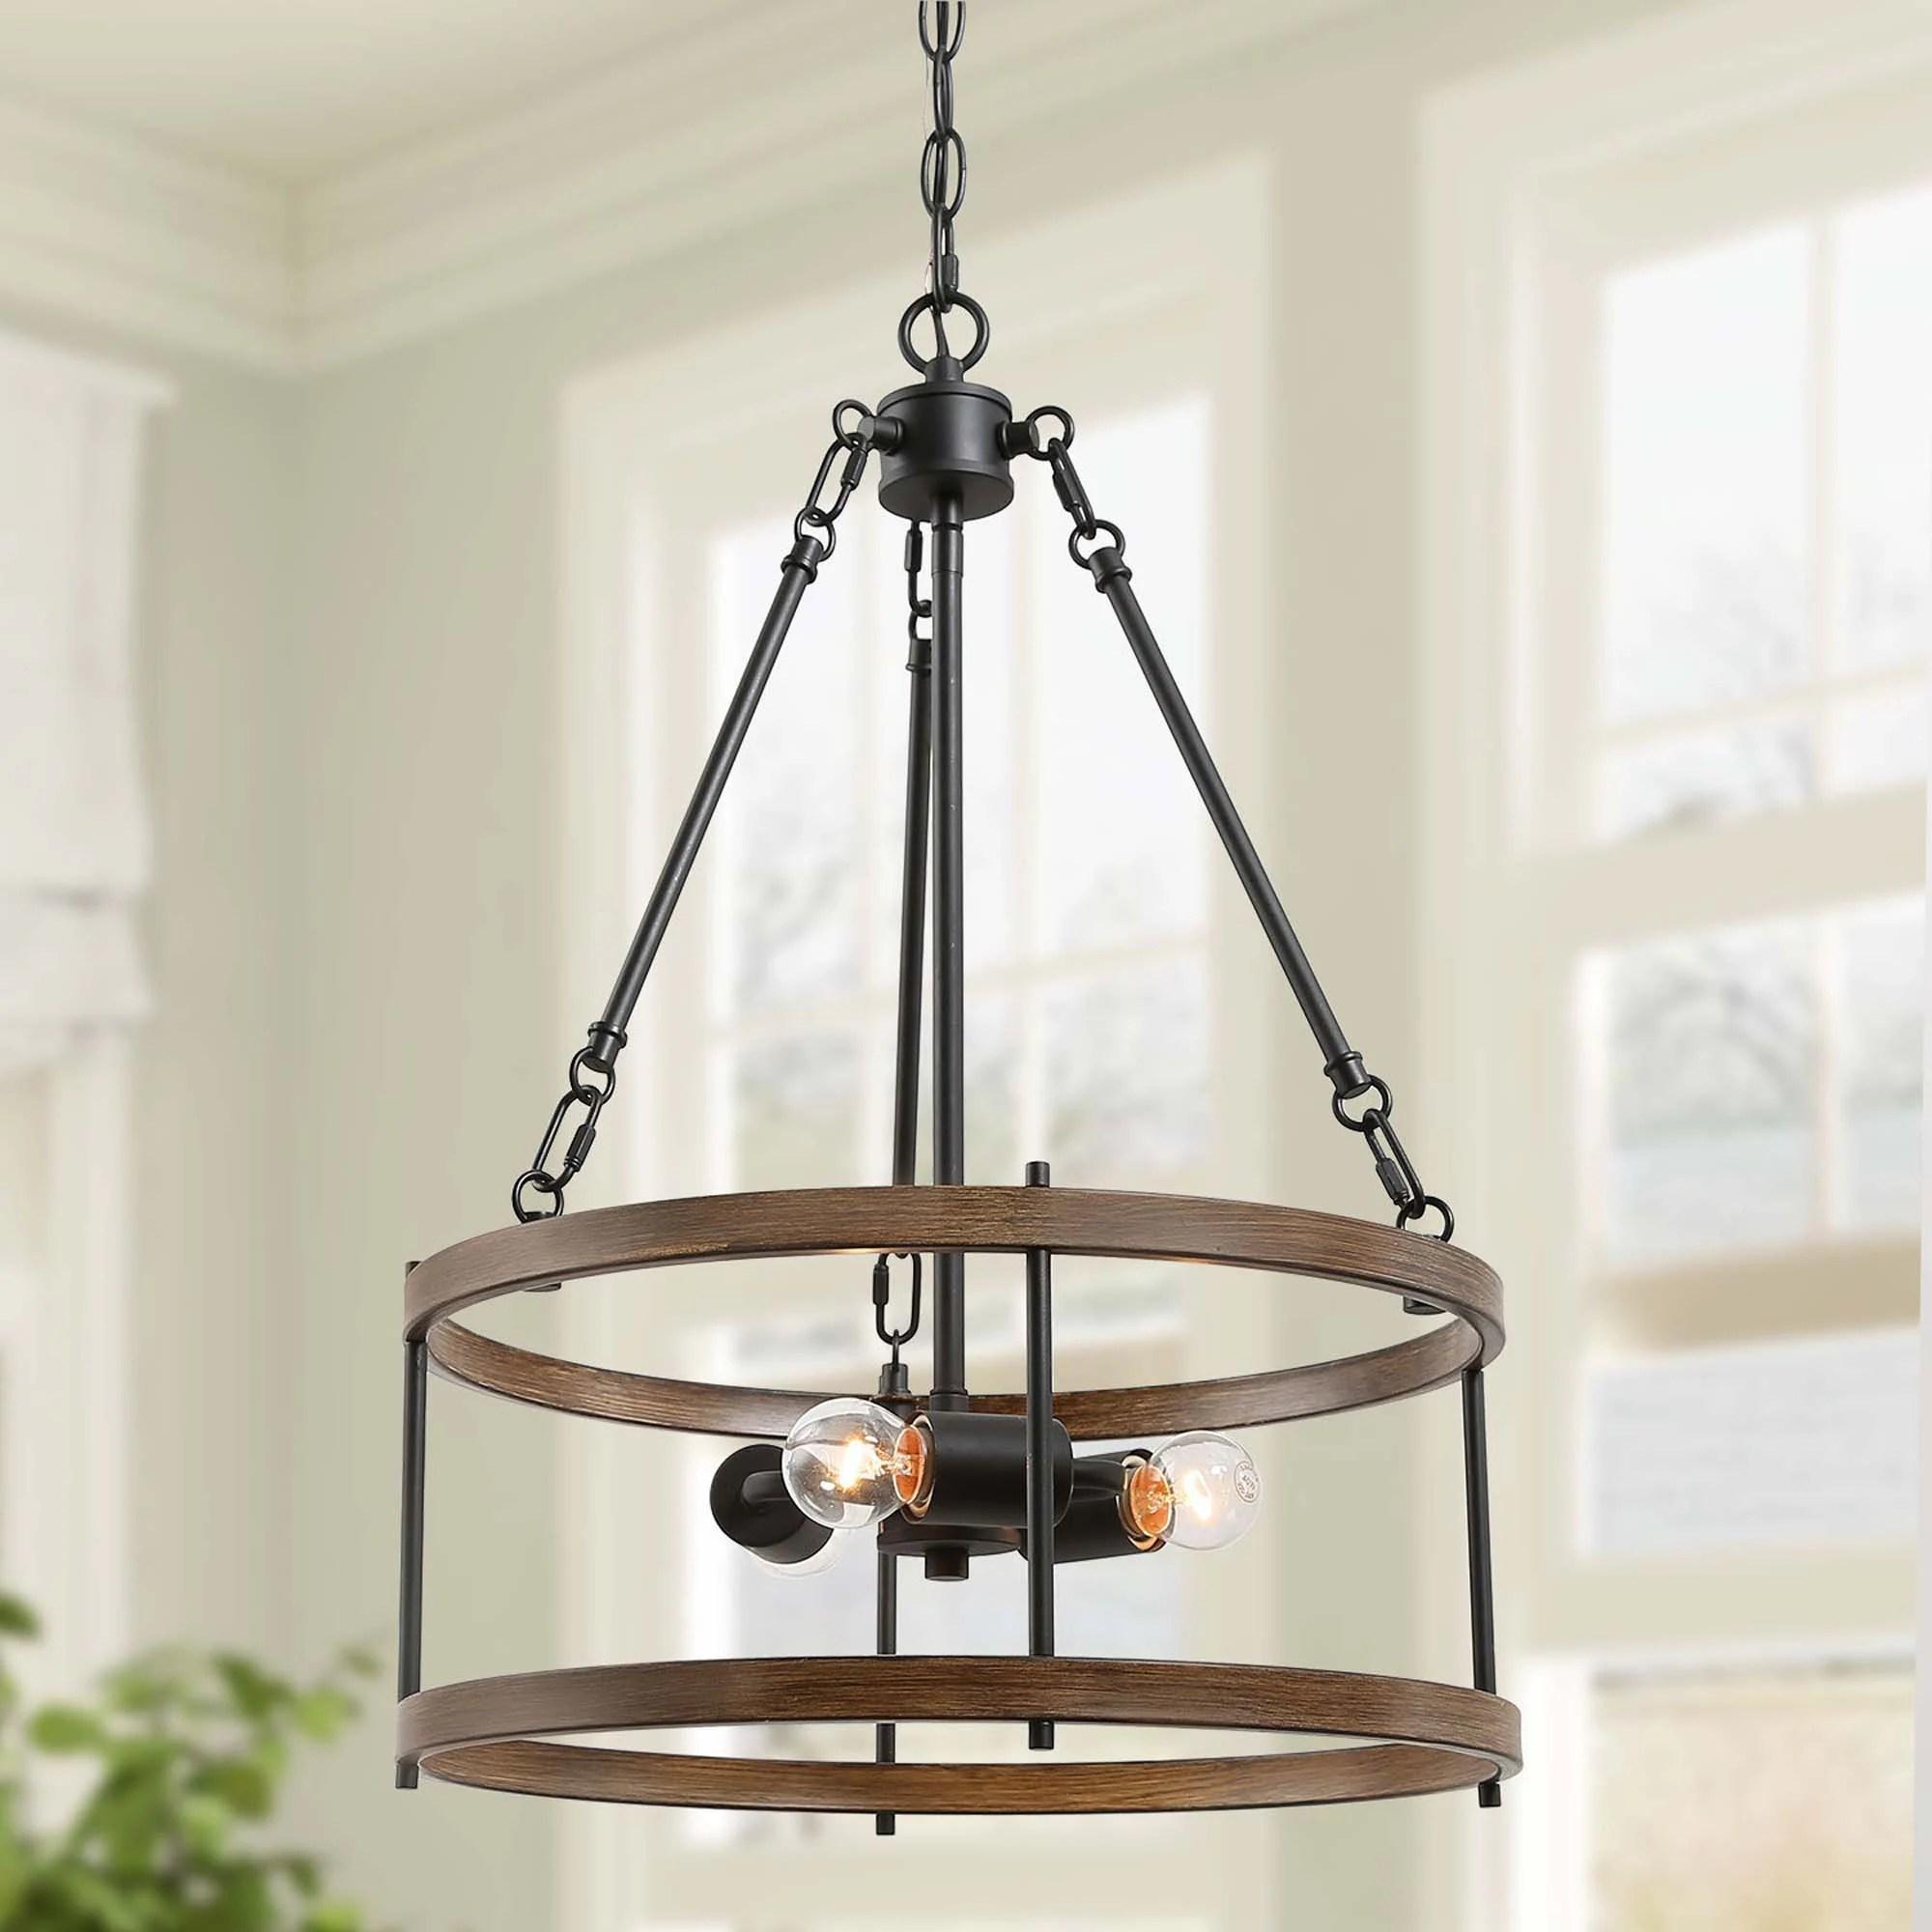 modern rustic 3 light brown faux wood grain metal drum pendant lighting for kitchen w15 8 xh22 8